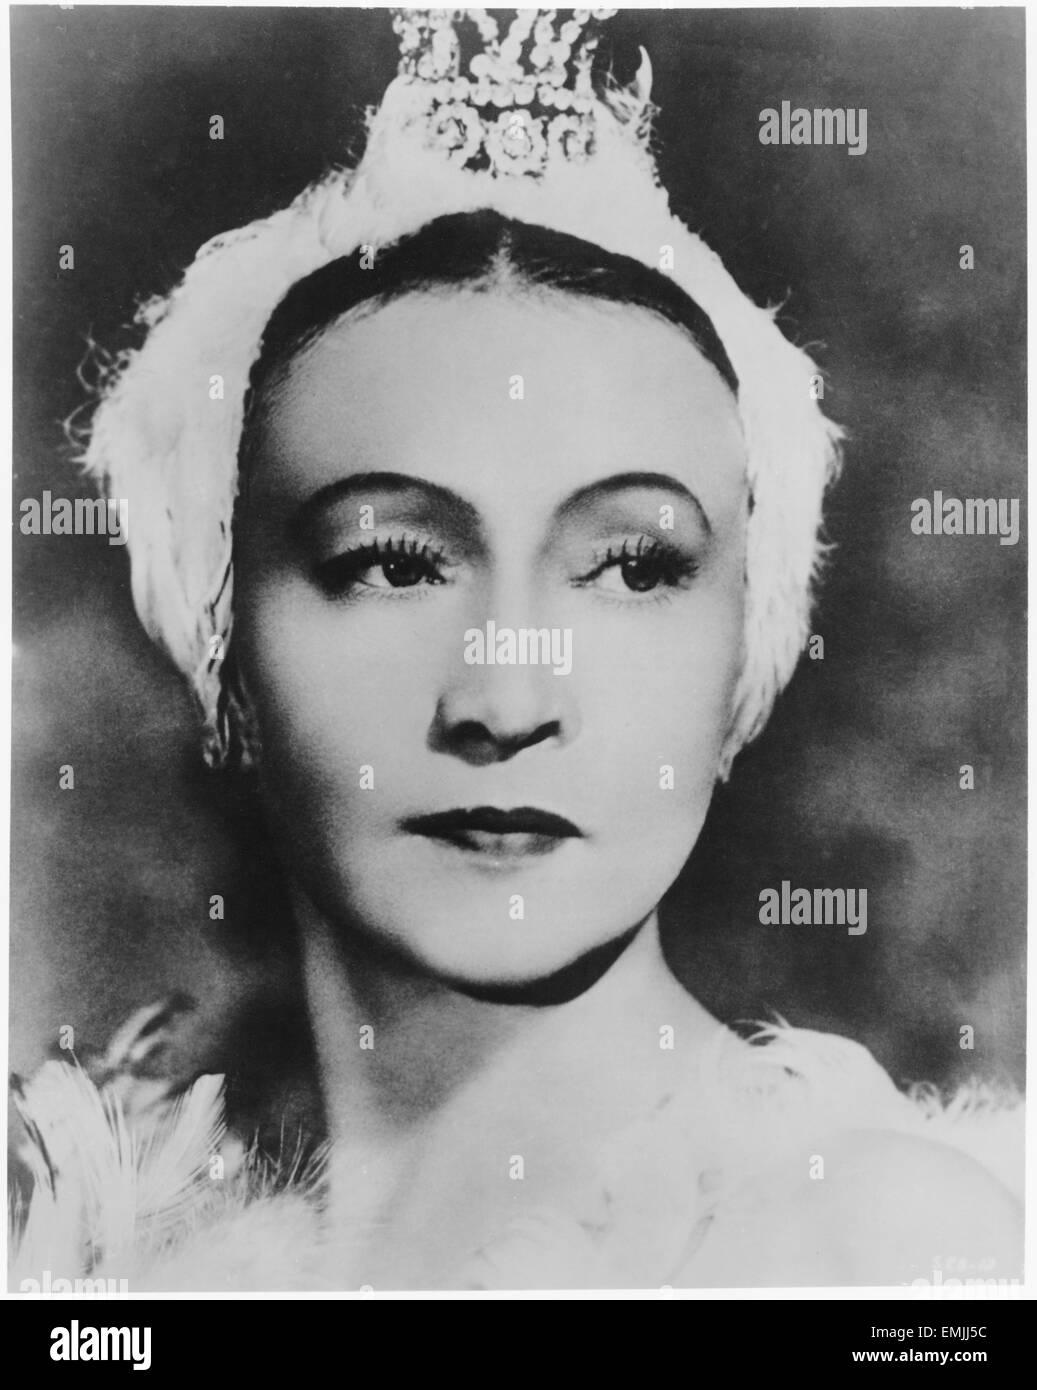 Maya Plisetskaya, Russian Ballerina, Portrait, circa 1960's - Stock Image